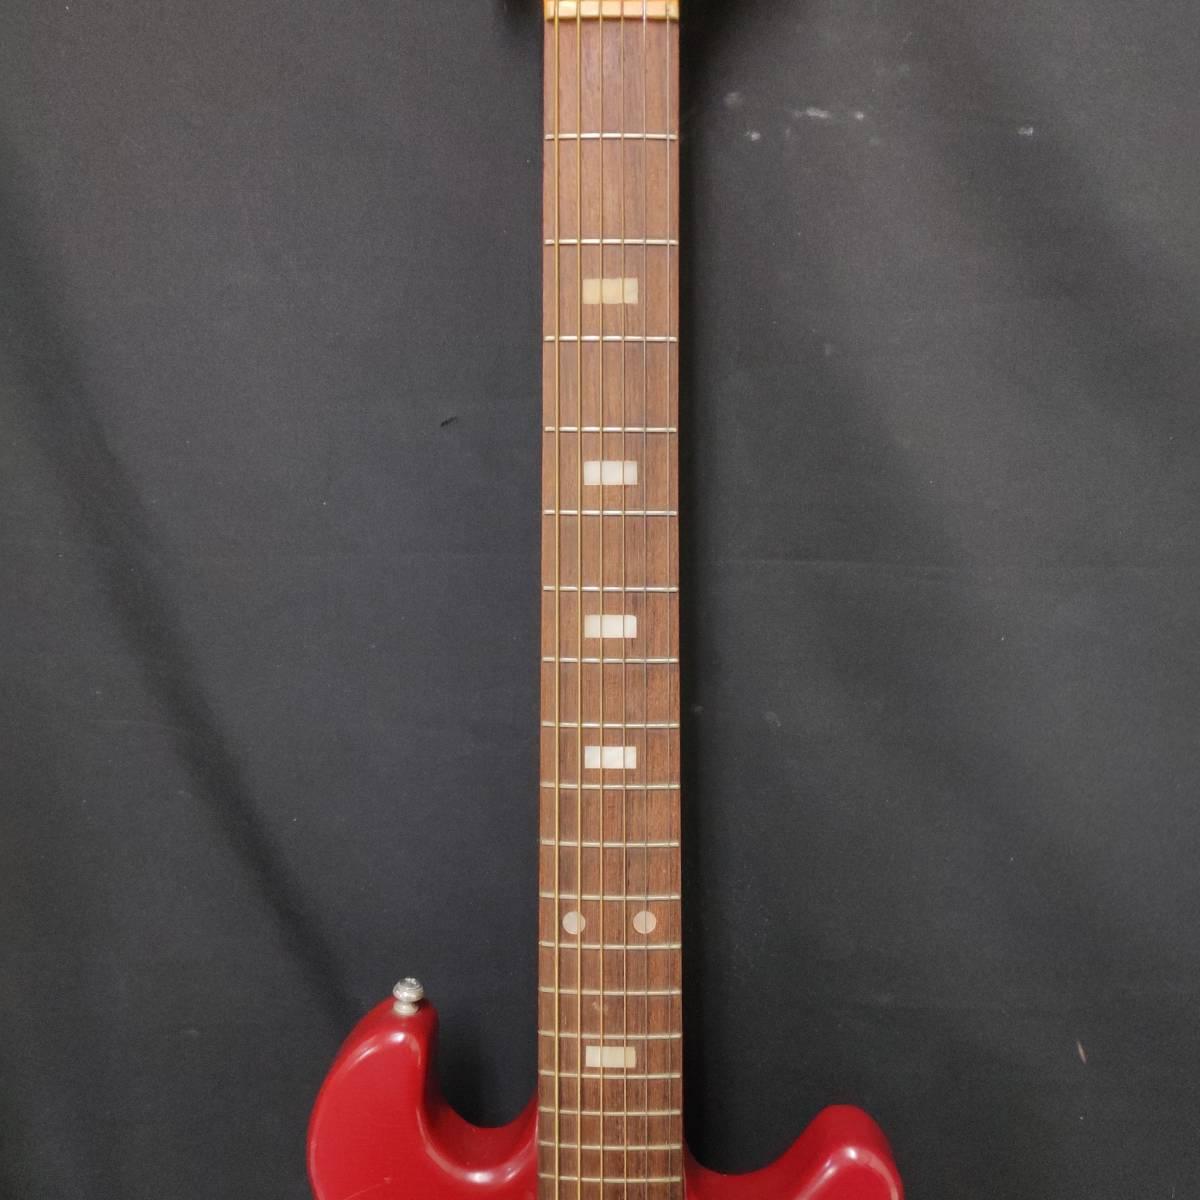 A22m11T GUYA TONE エレキギター LG-85T 本体 約100cm グヤトーン ビンテージ レッド 赤色_画像3